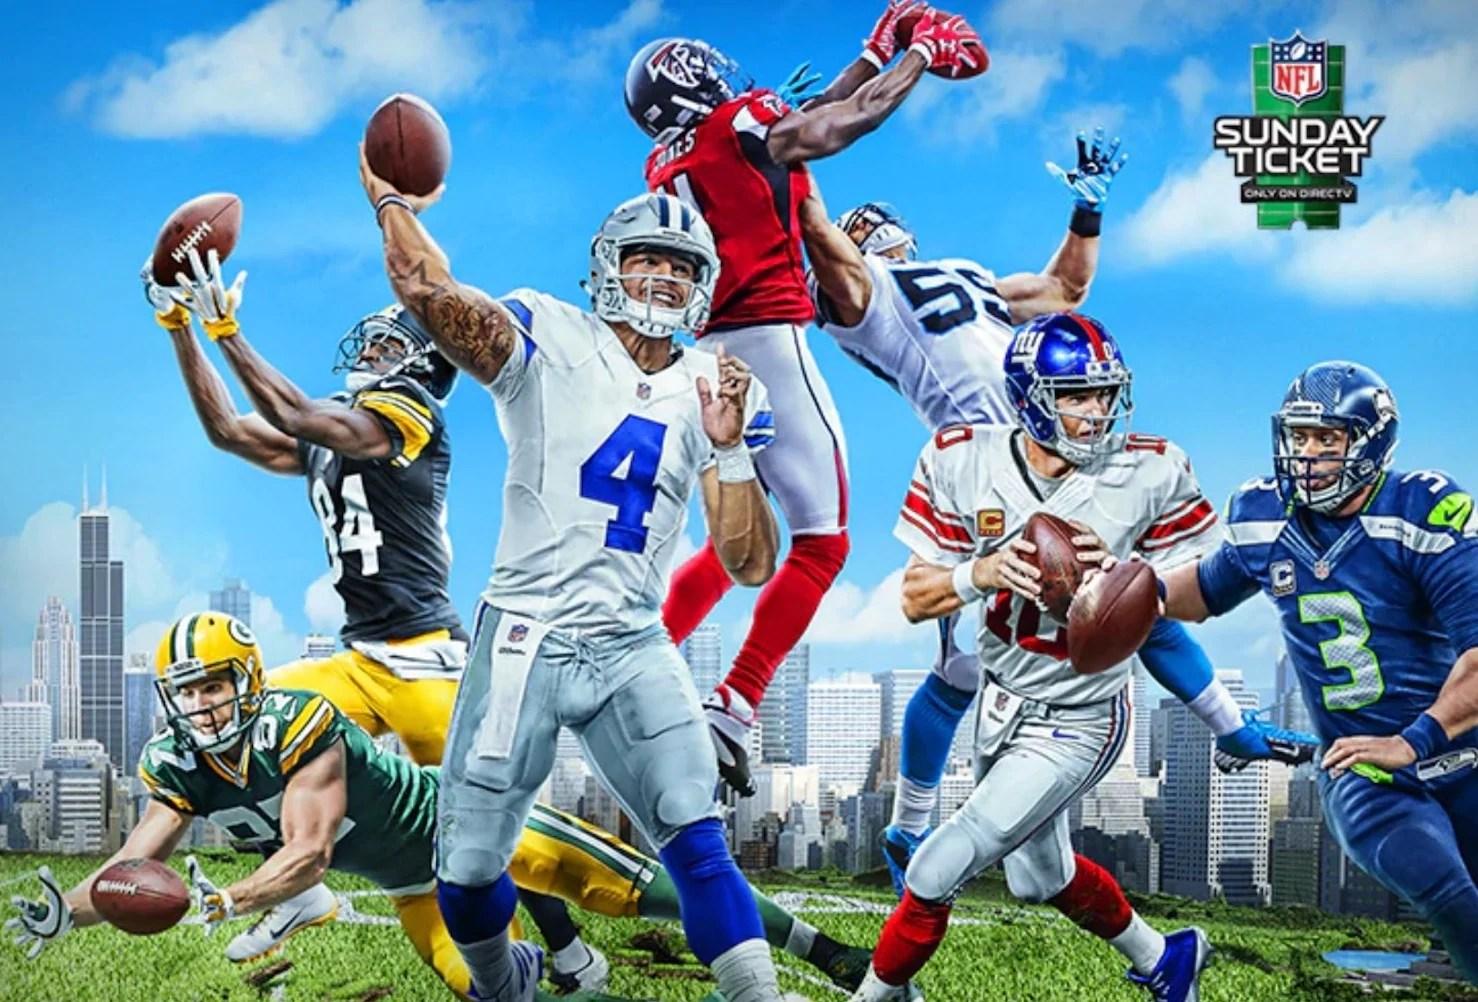 NFL SUNDAY TICKET | 2020 NFL Season | DIRECTV Official Site